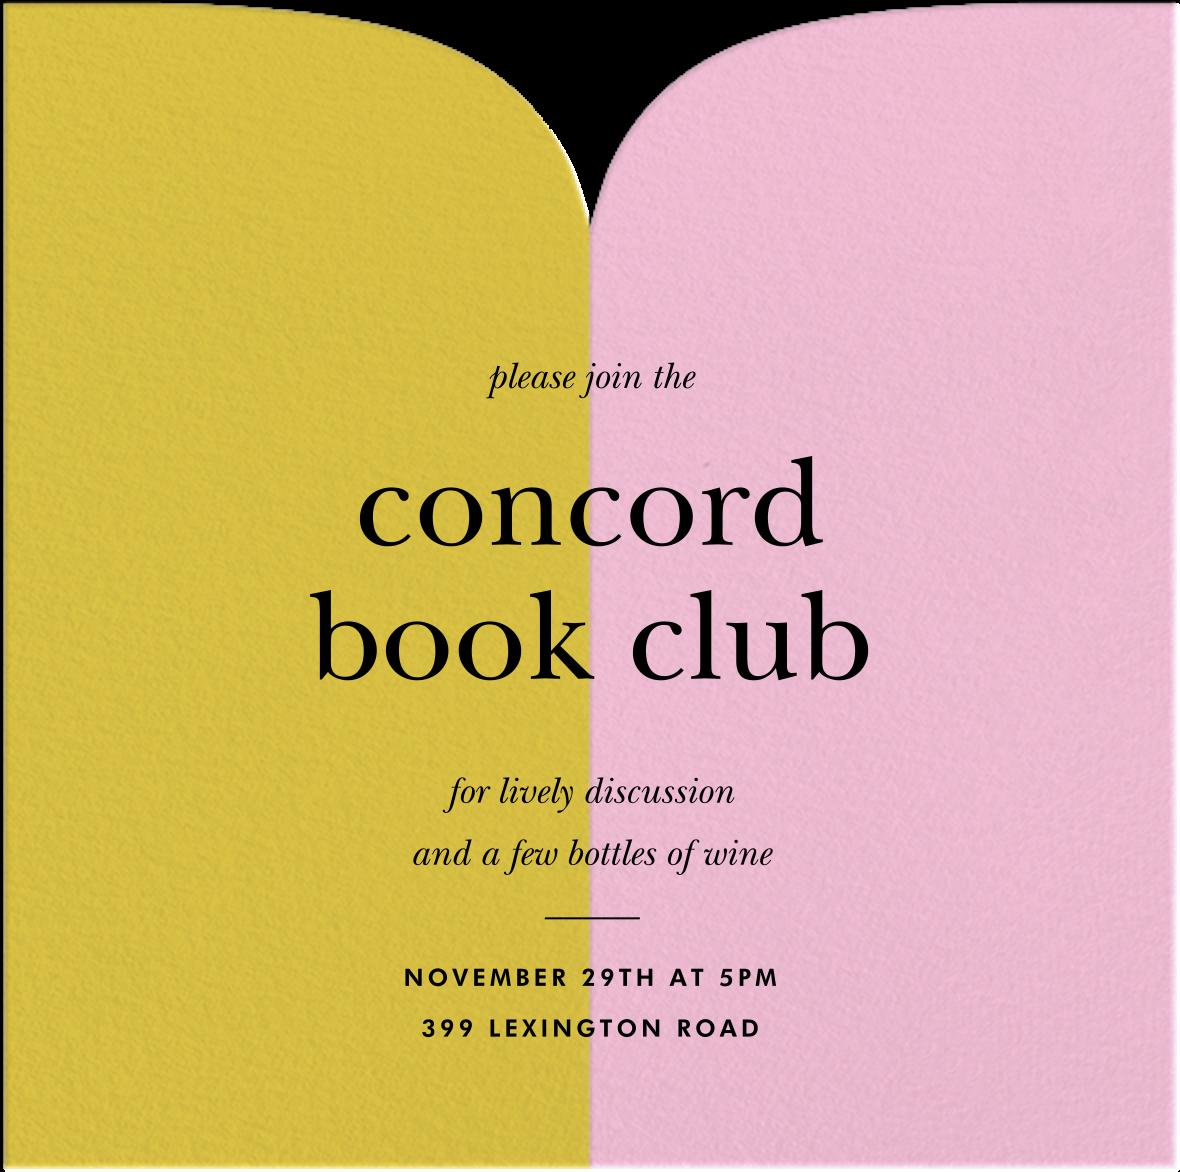 Two Halves - Paella/Pavlova - kate spade new york - Book club